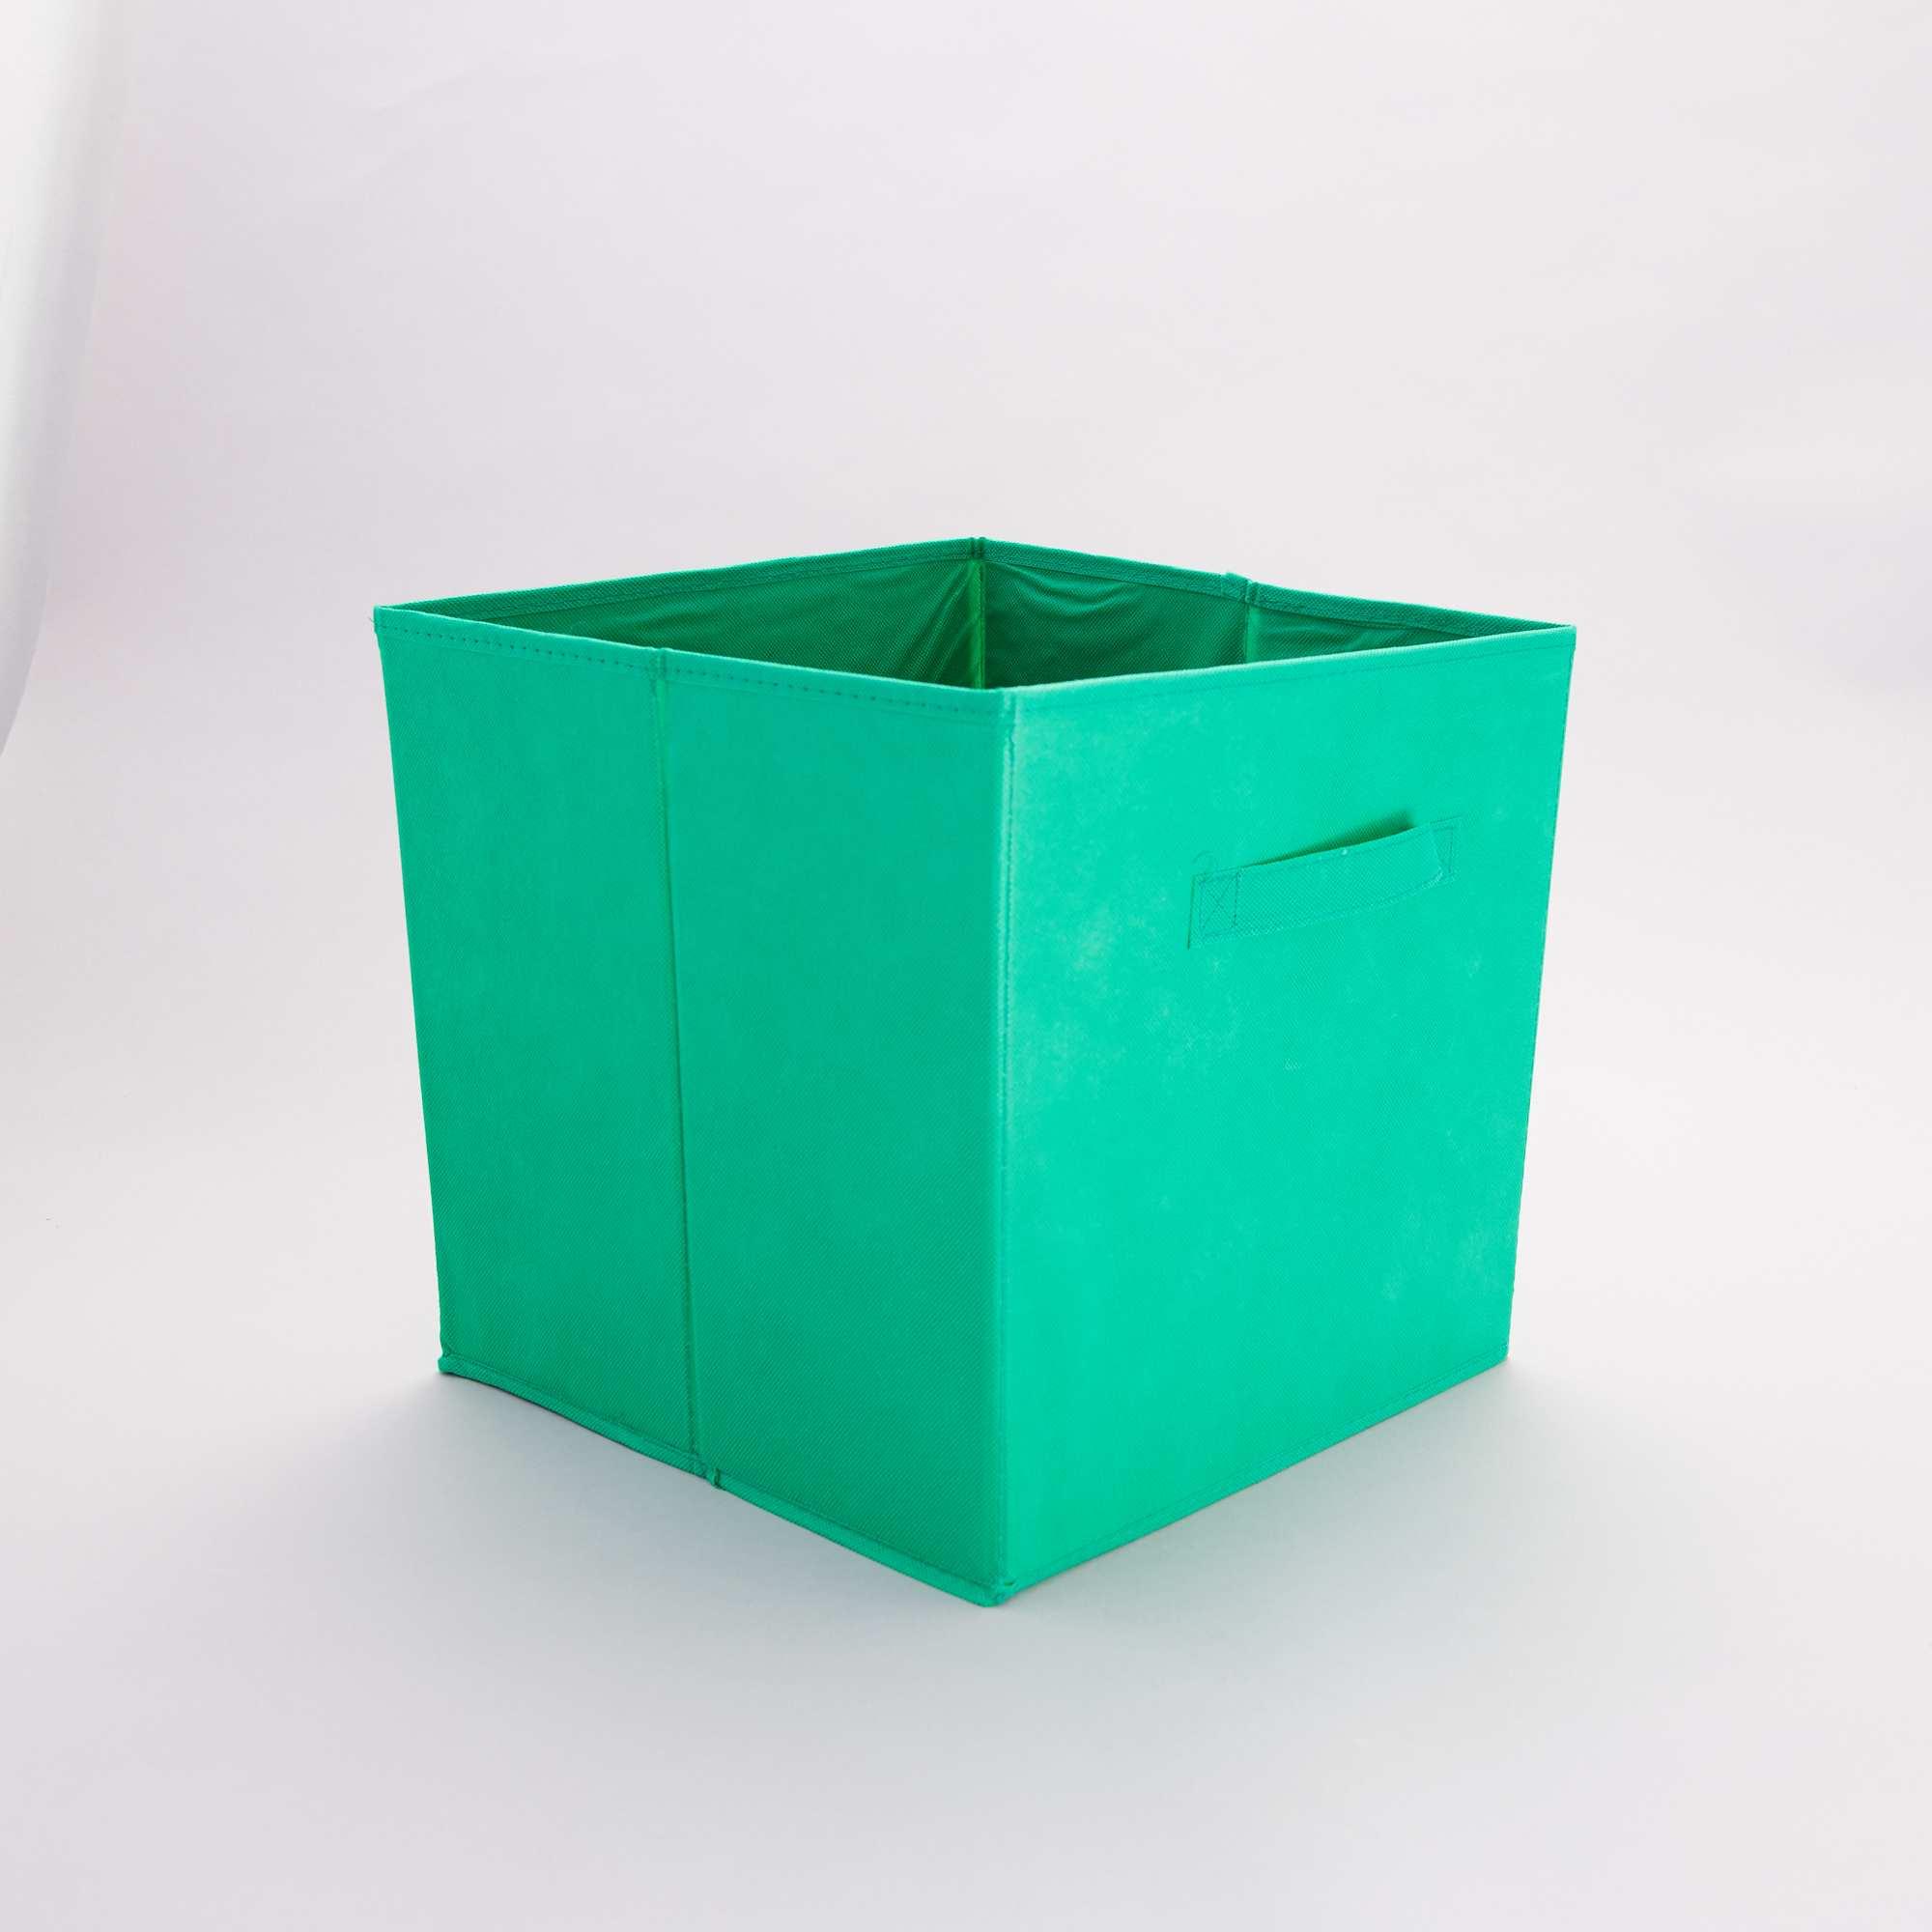 Accessoire Salle De Bain Vert Emeraude ~ panier pliable intiss linge de lit vert emeraude kiabi 4 00